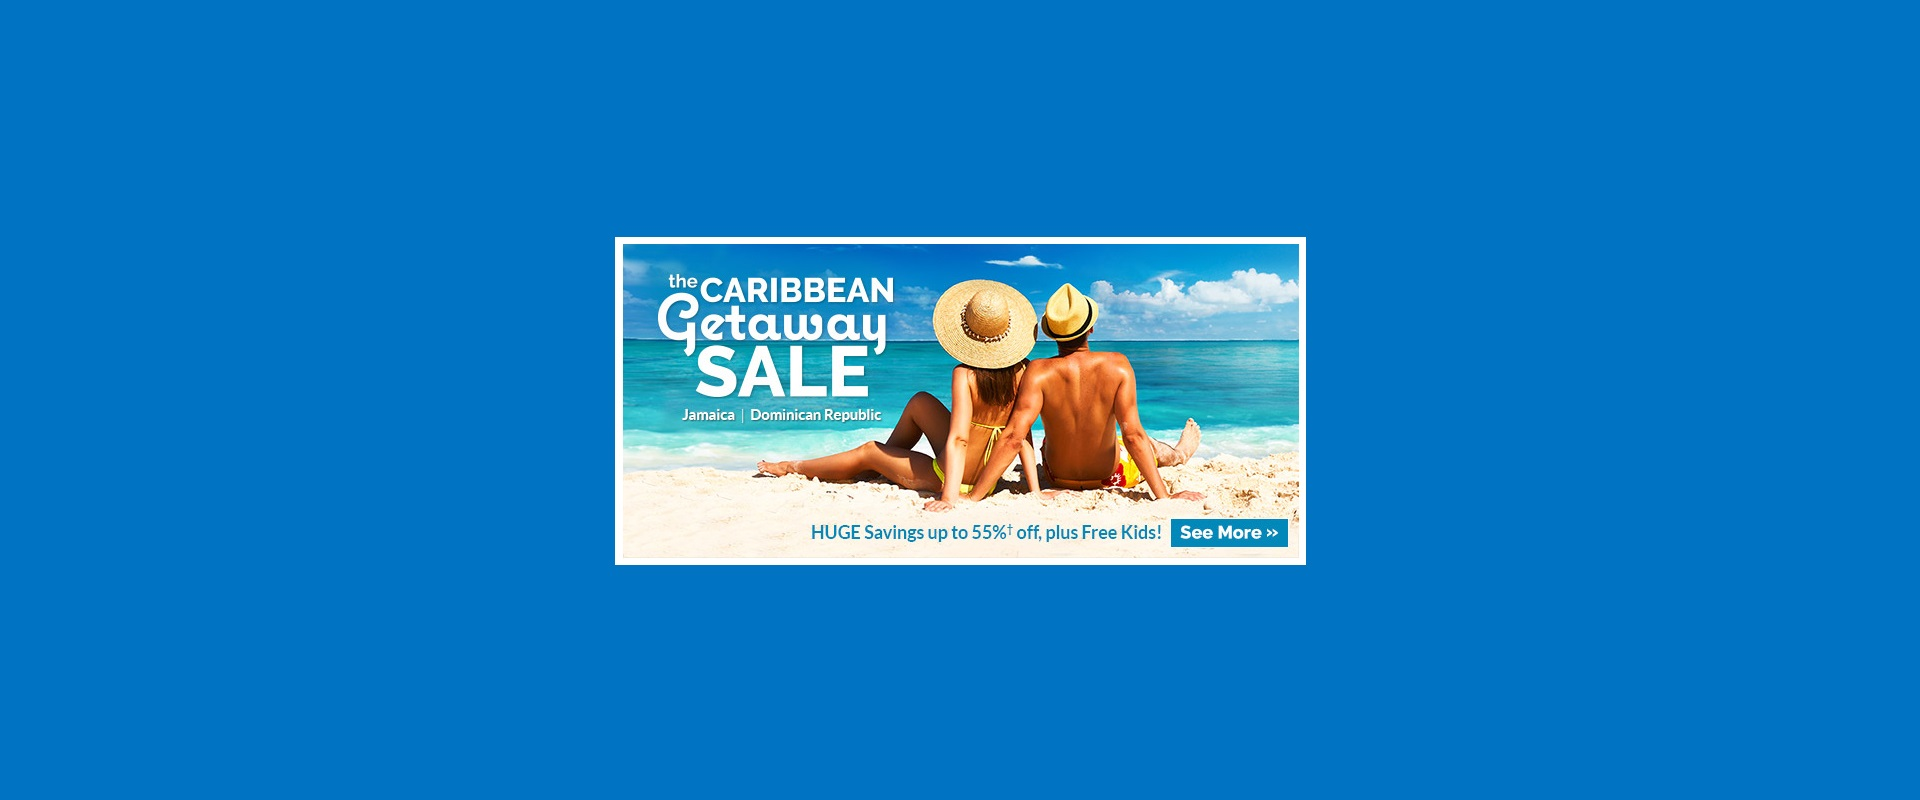 Caribbean-Getaway-Sale-Header